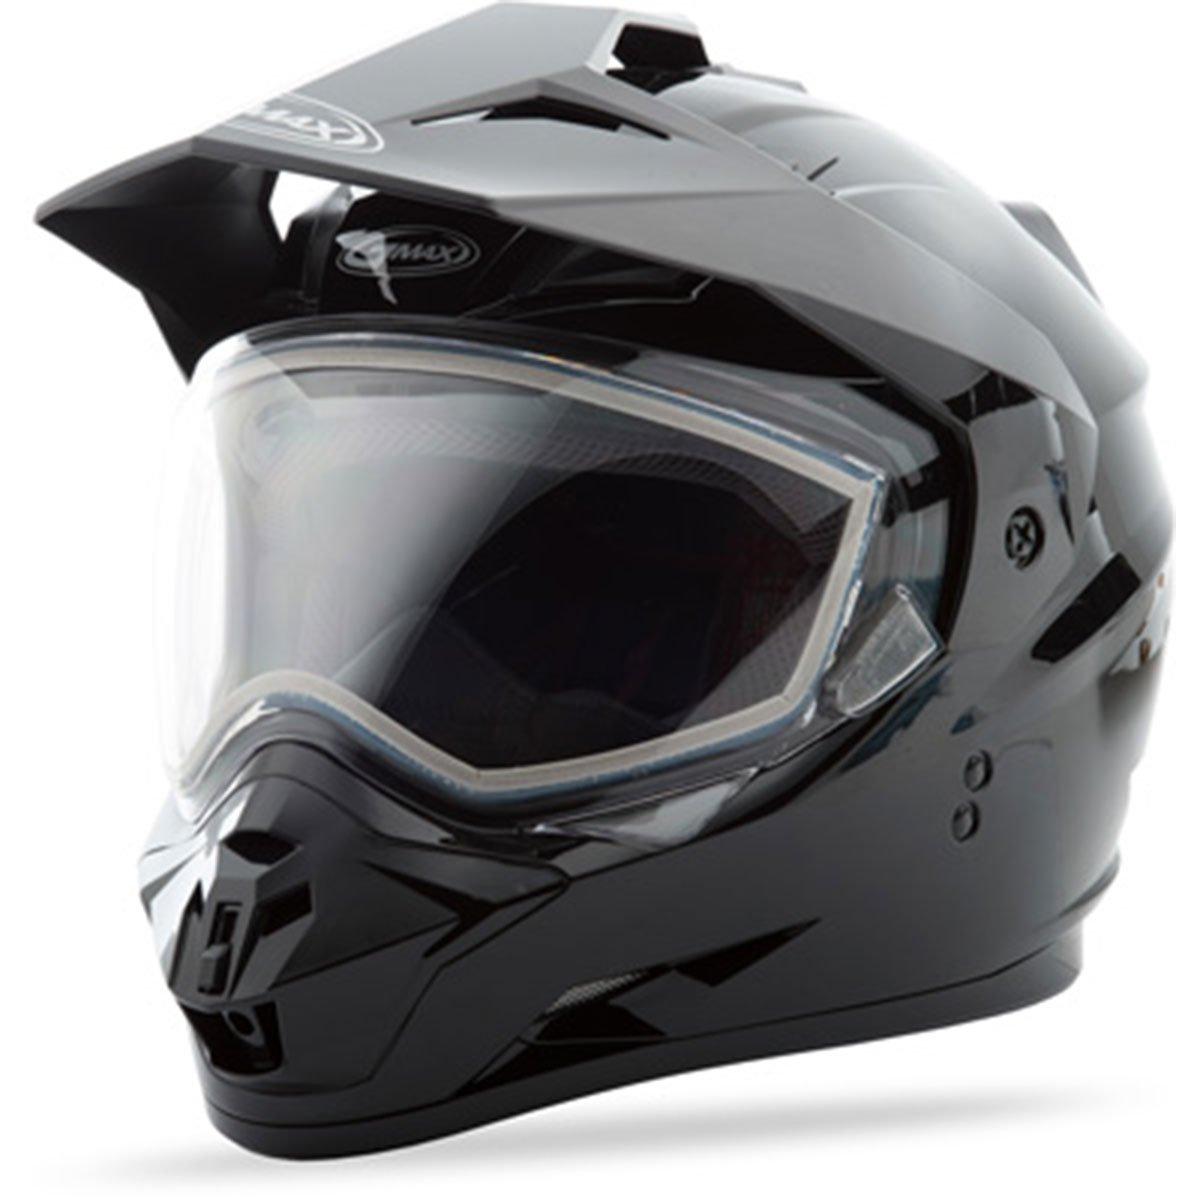 GMAX unisex-adult full-face-helmet-style Helmet (Gm11S Sport ) (Black, Large)